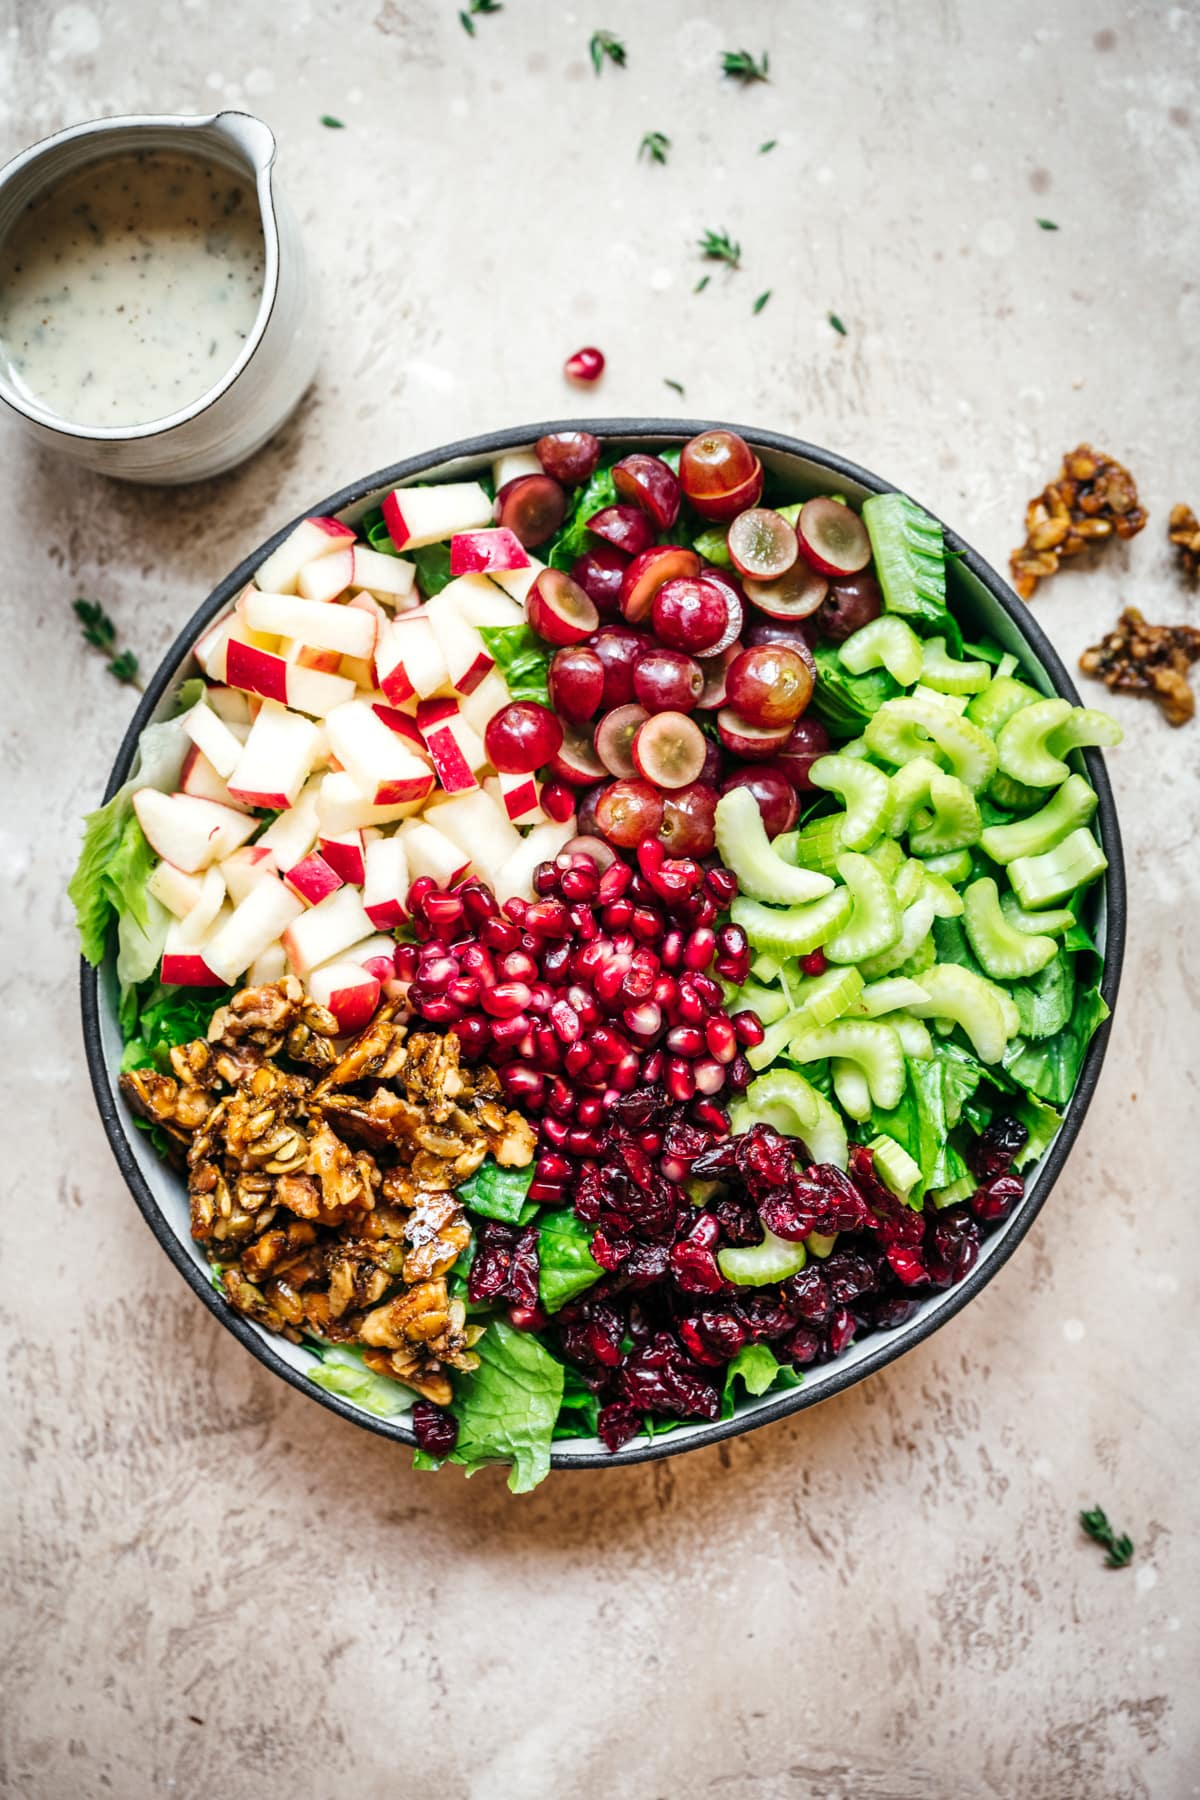 overhead view of vegan waldorf salad in bowl before adding dressing.